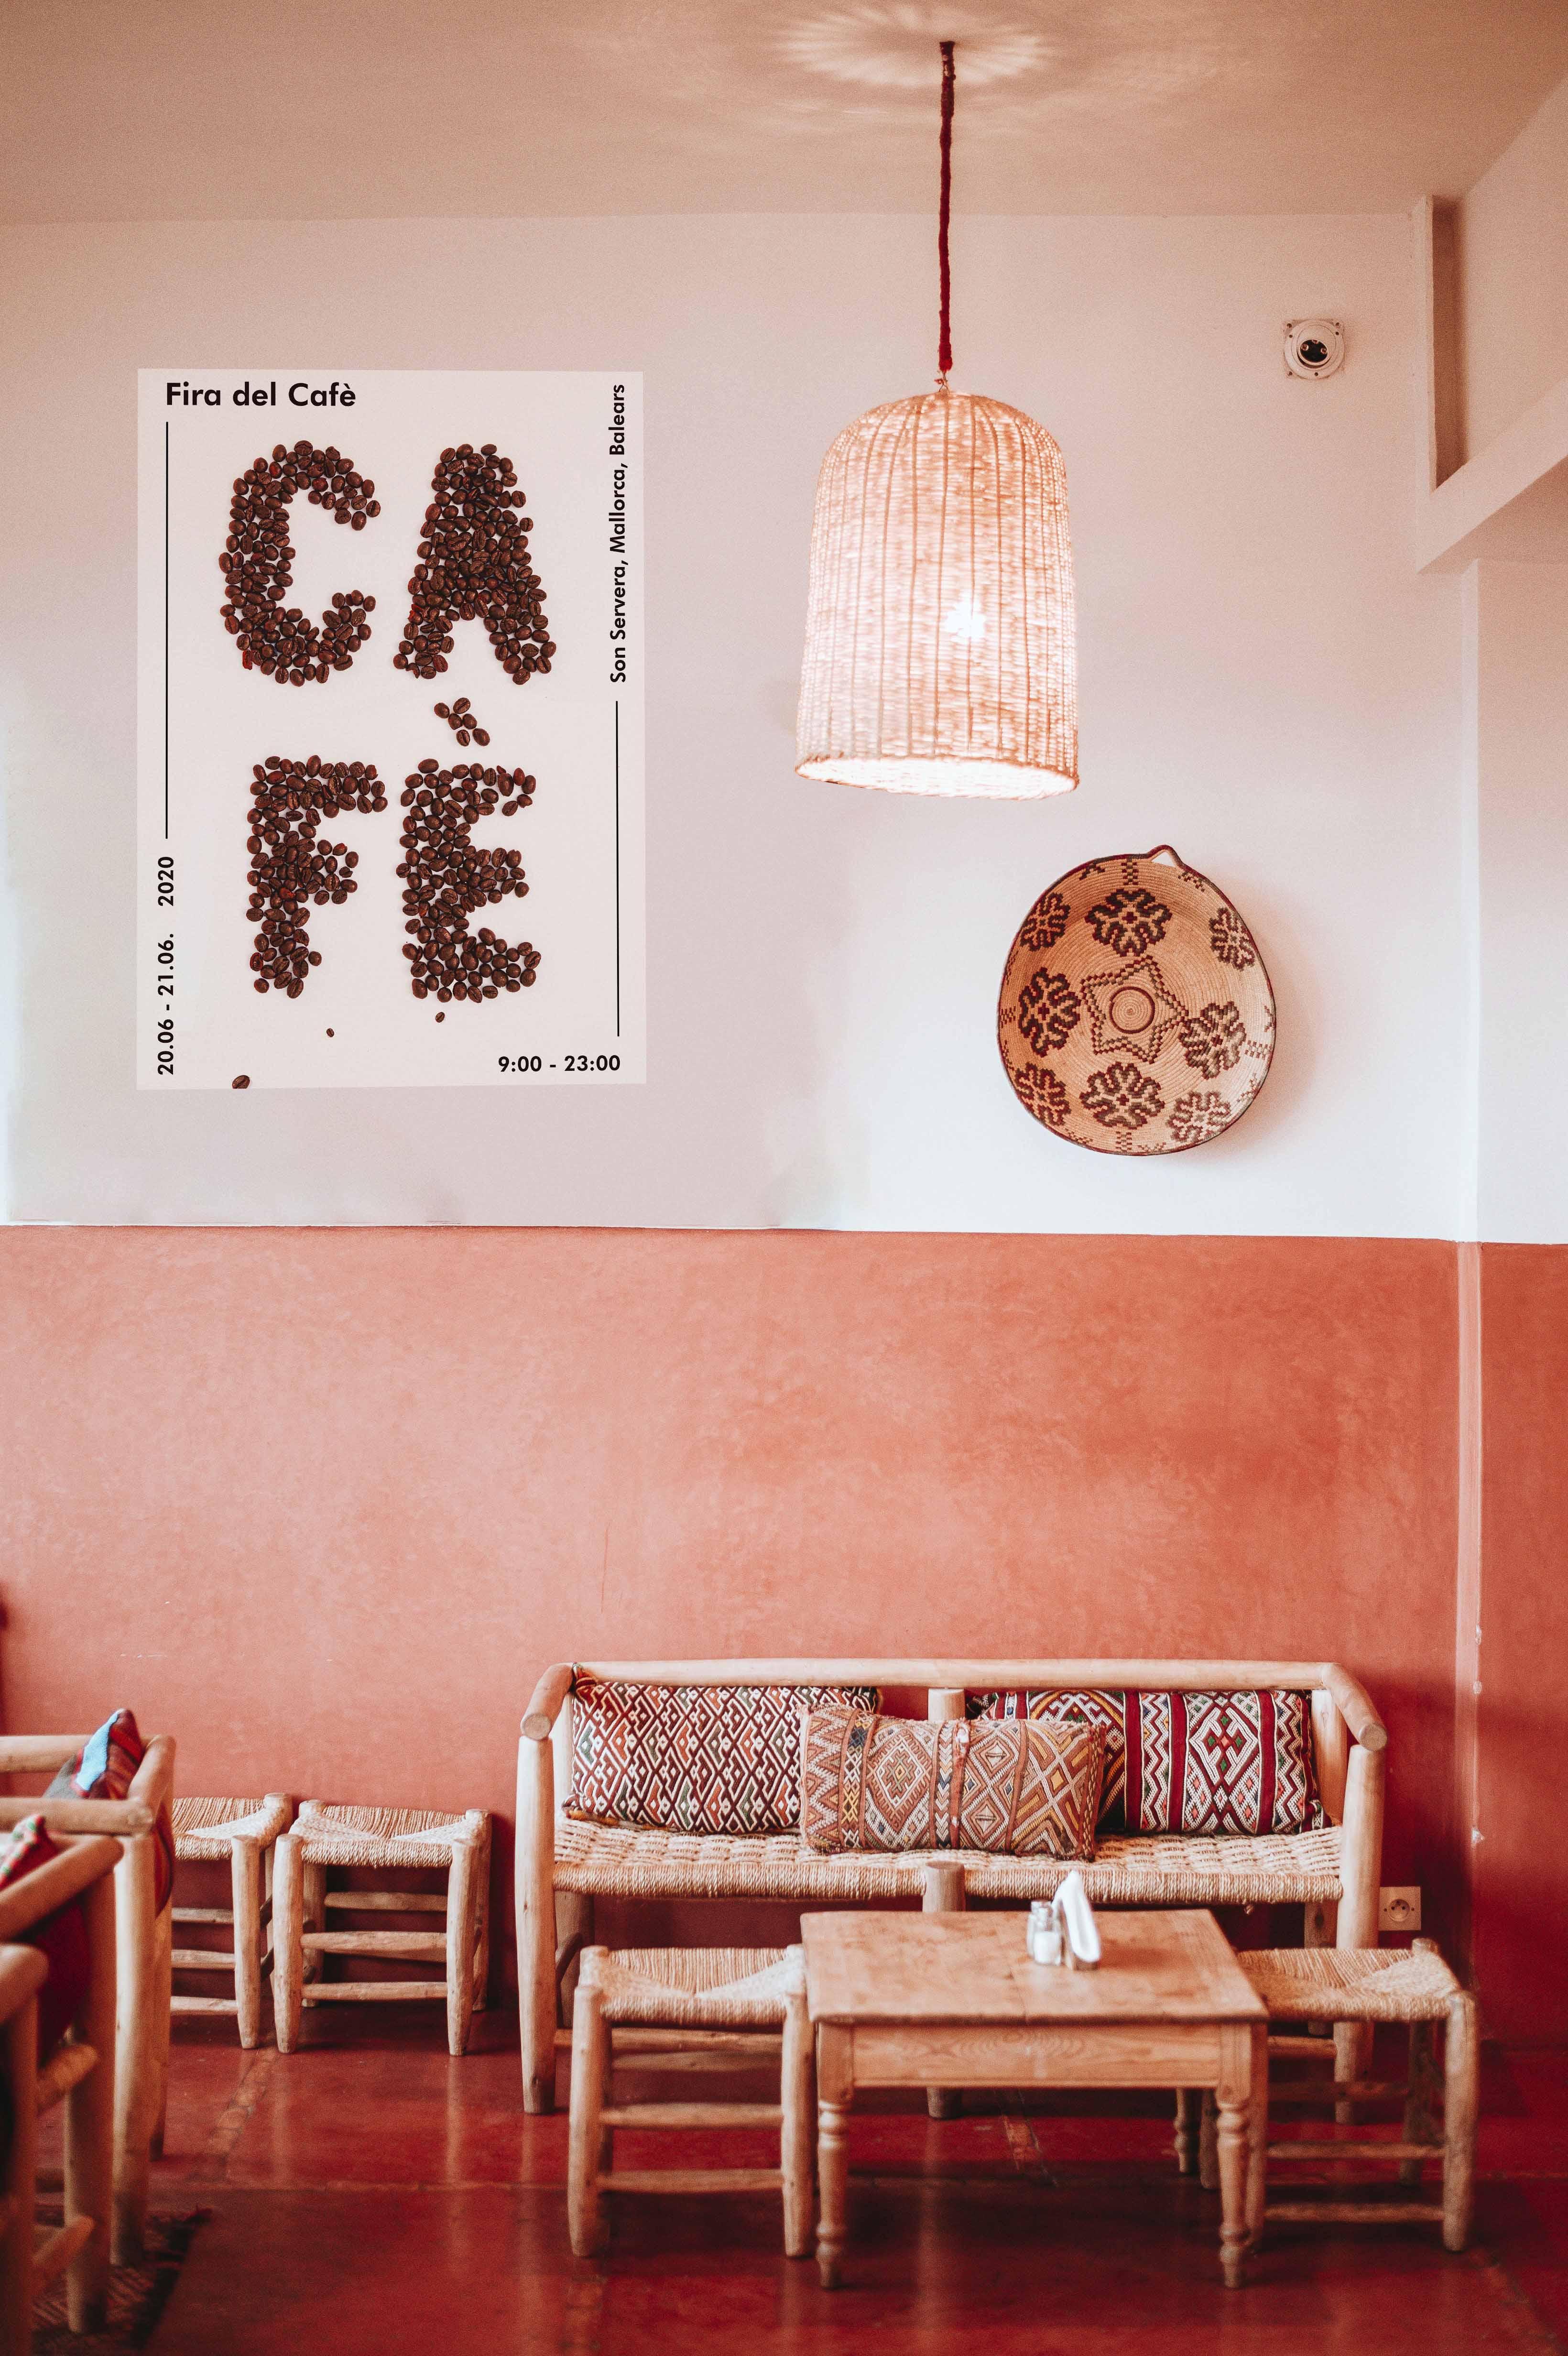 Cartel Feria del café by Raquel Castañeda Gelabert - Creative Work - $i